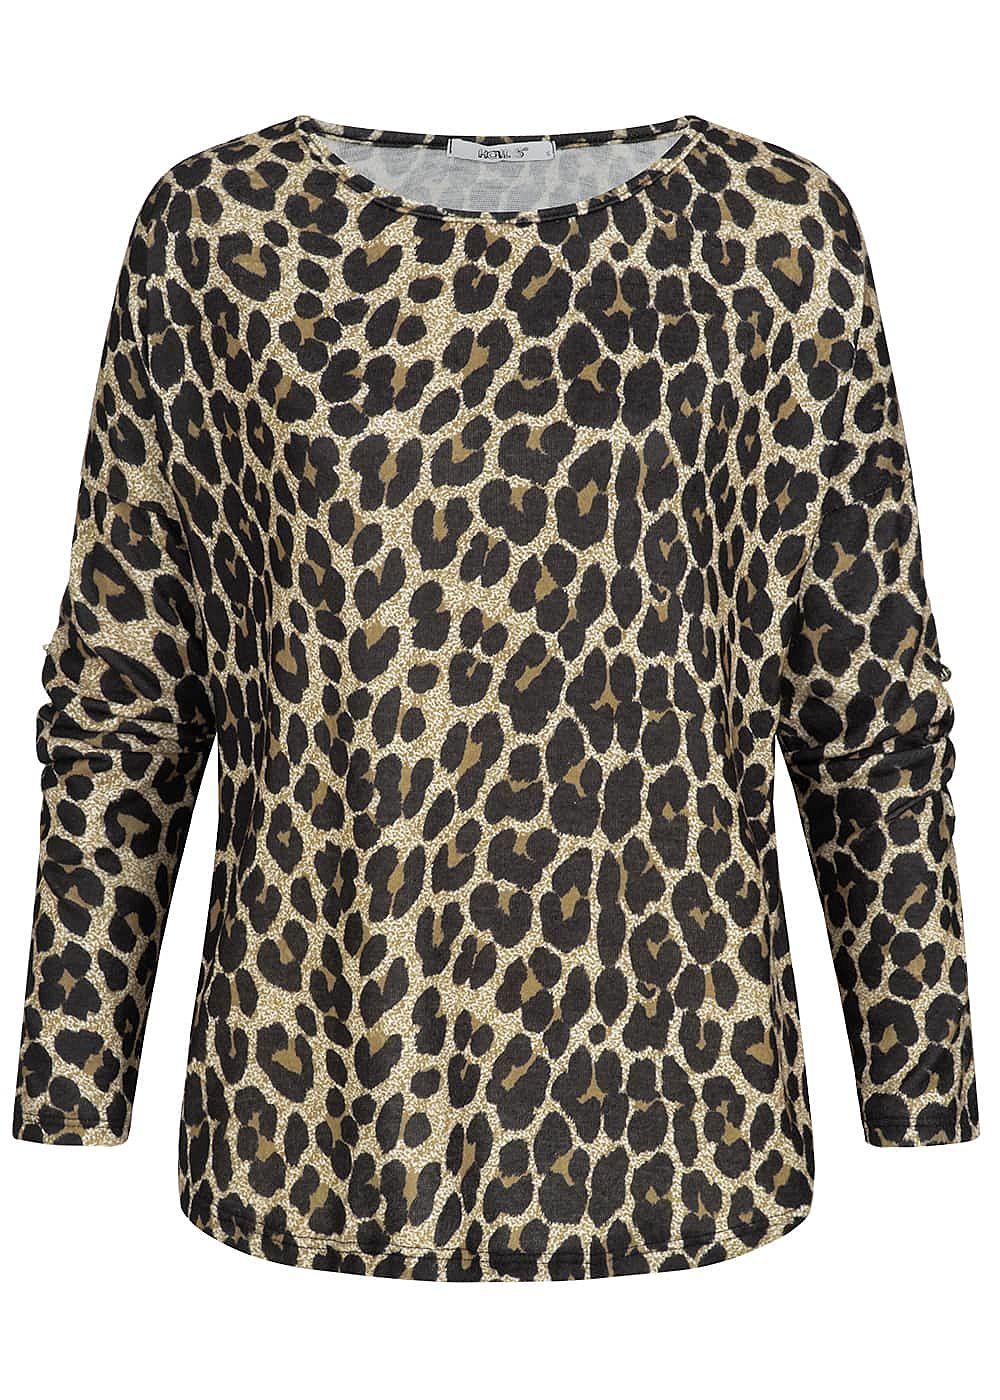 decd7e3323270f Hailys Damen Turn-Up Shirt Leo Print braun schwarz - 77onlineshop